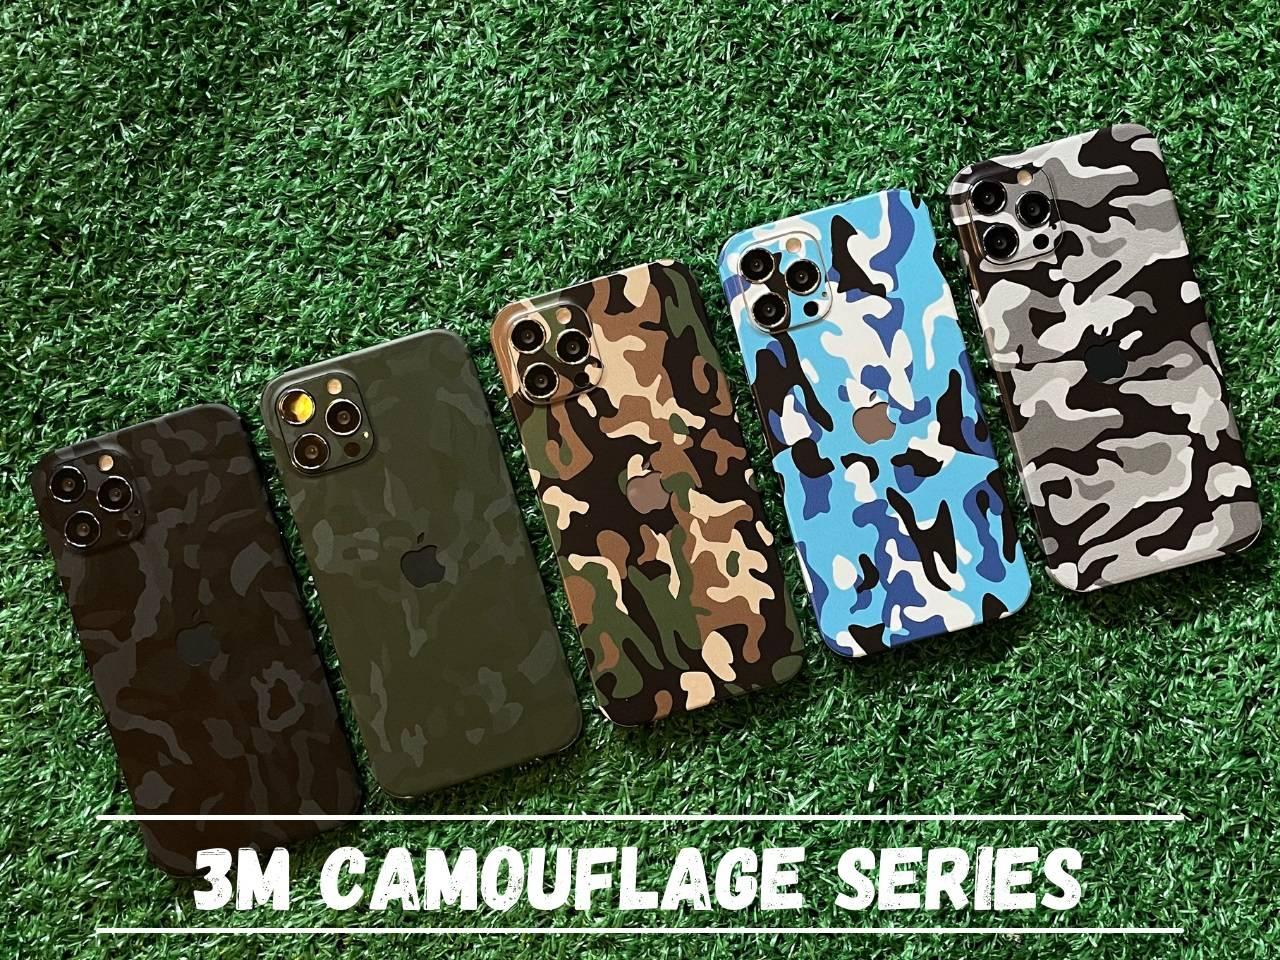 Mojoskins 3M Camouflage Series